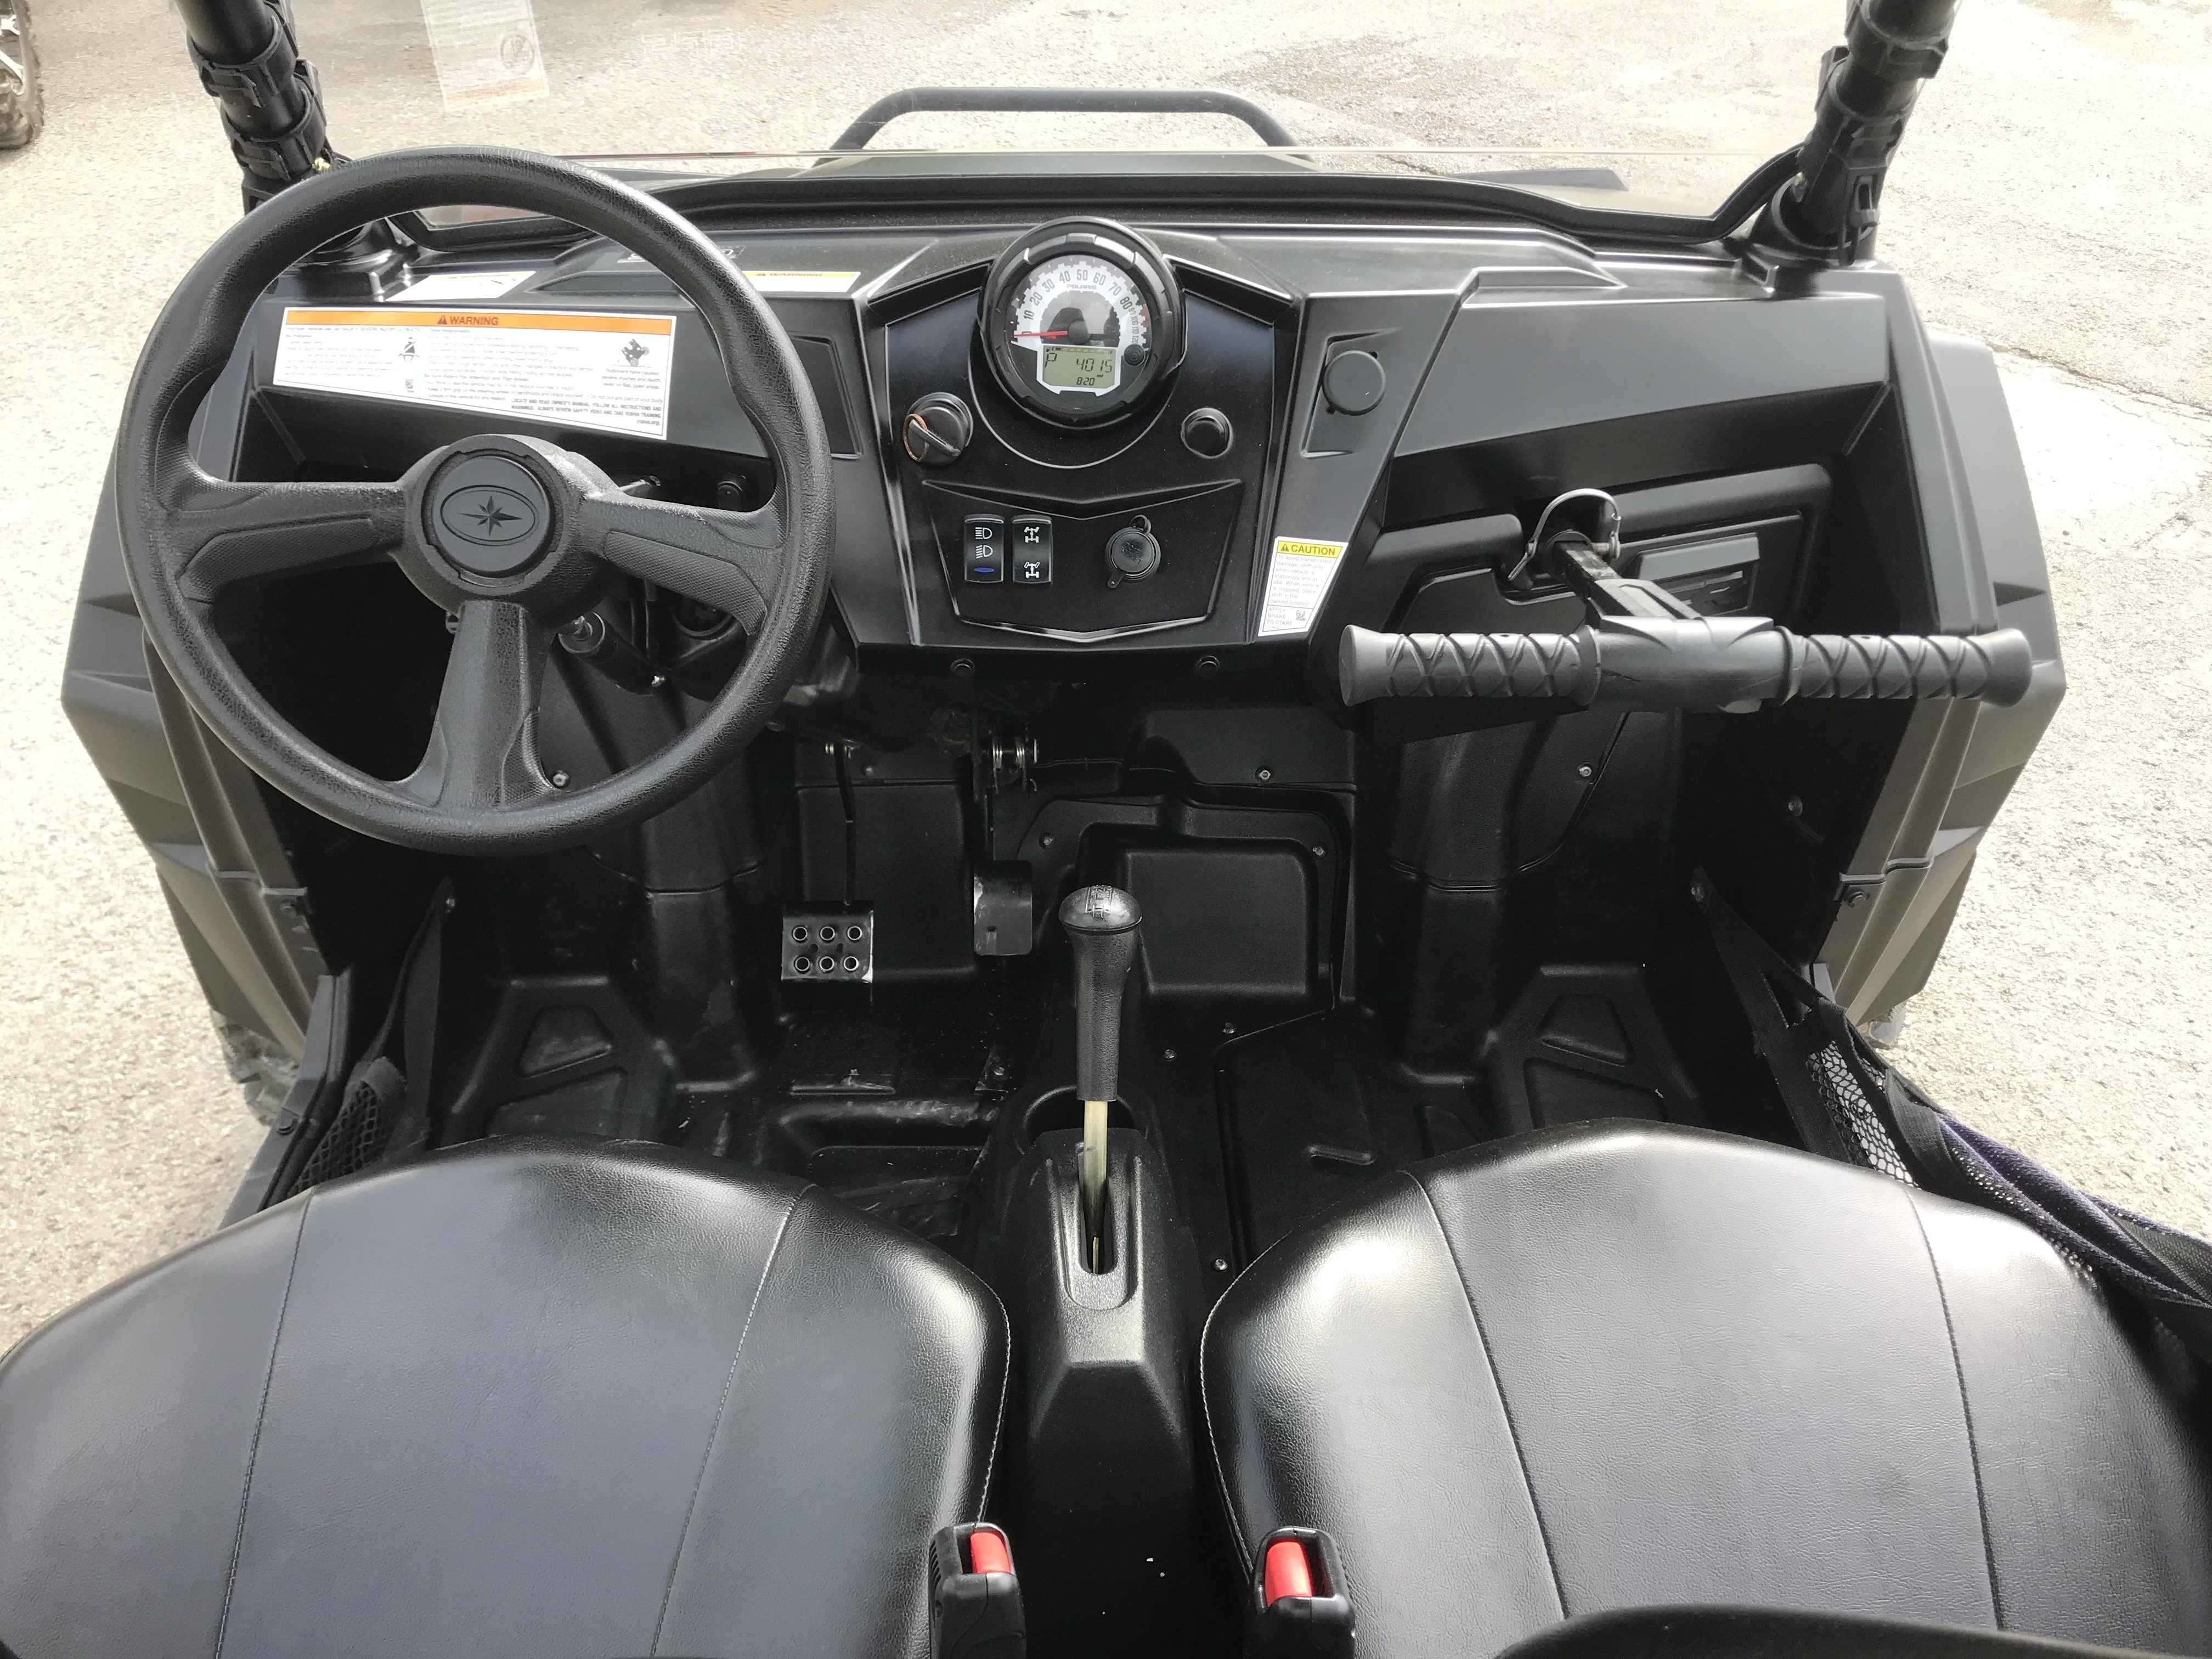 2014 Polaris RZR XP 900 EPS LE - Stealth Black Edition